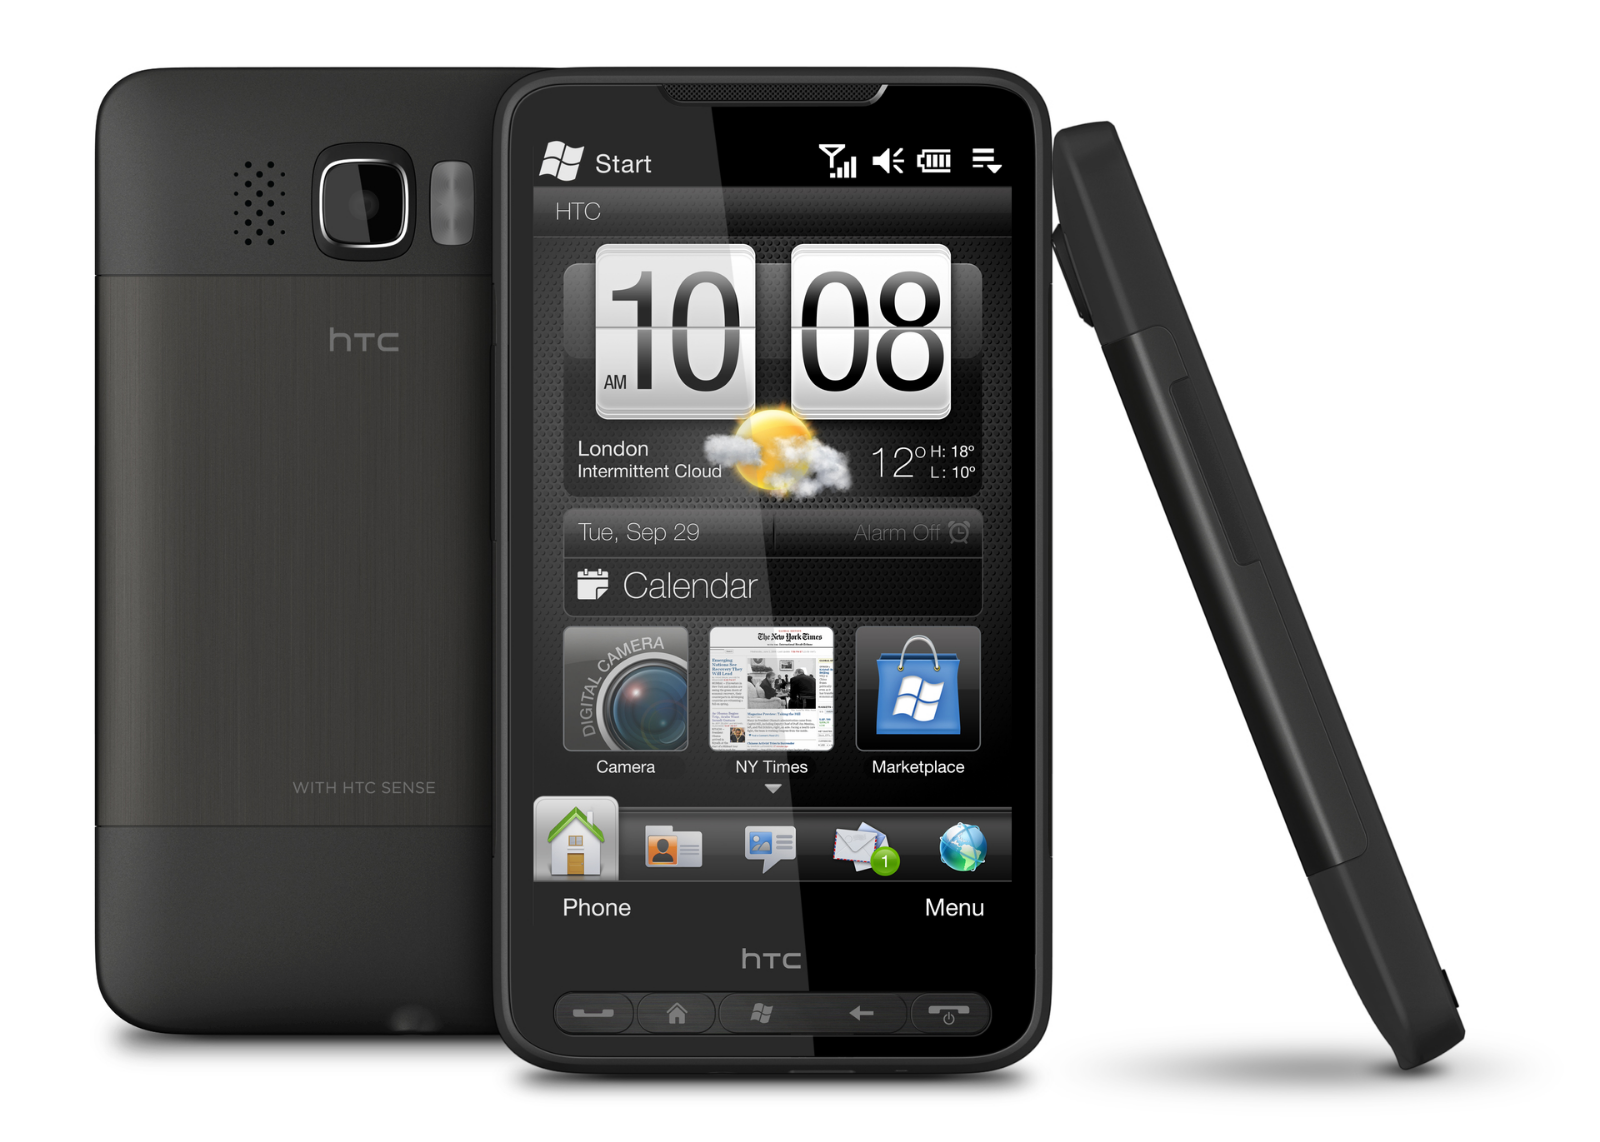 HTC HD2 Leo - Black (Unlocked) GSM 3G WiFi Windows Mobile Touch Smartphone 8